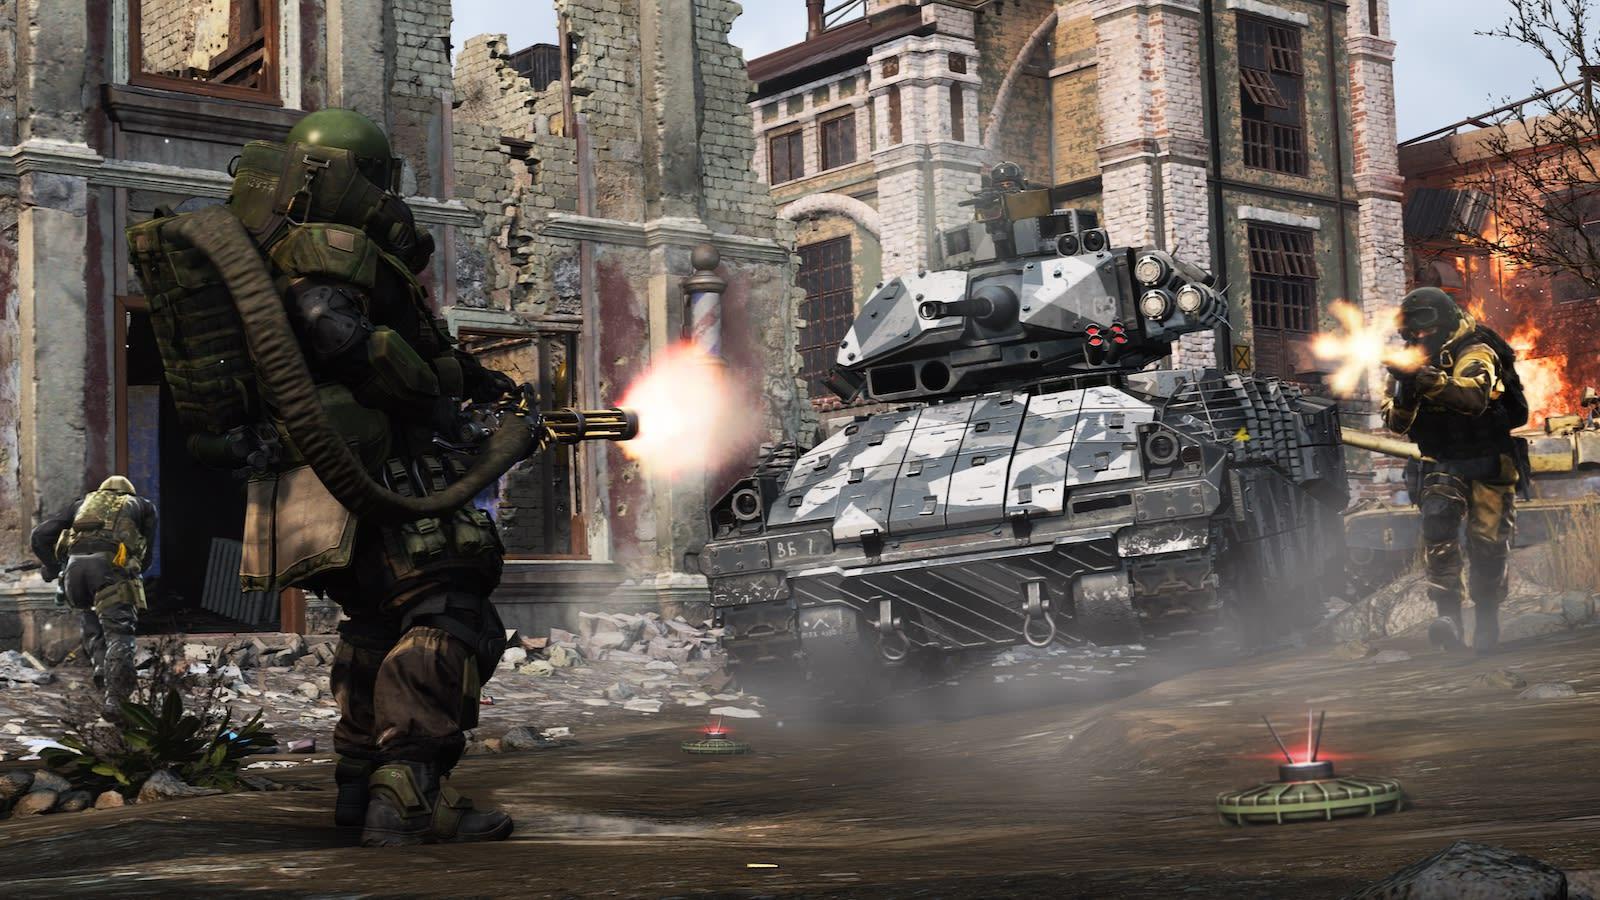 Call of Duty: Modern Warfare' multiplayer beta kicks off in